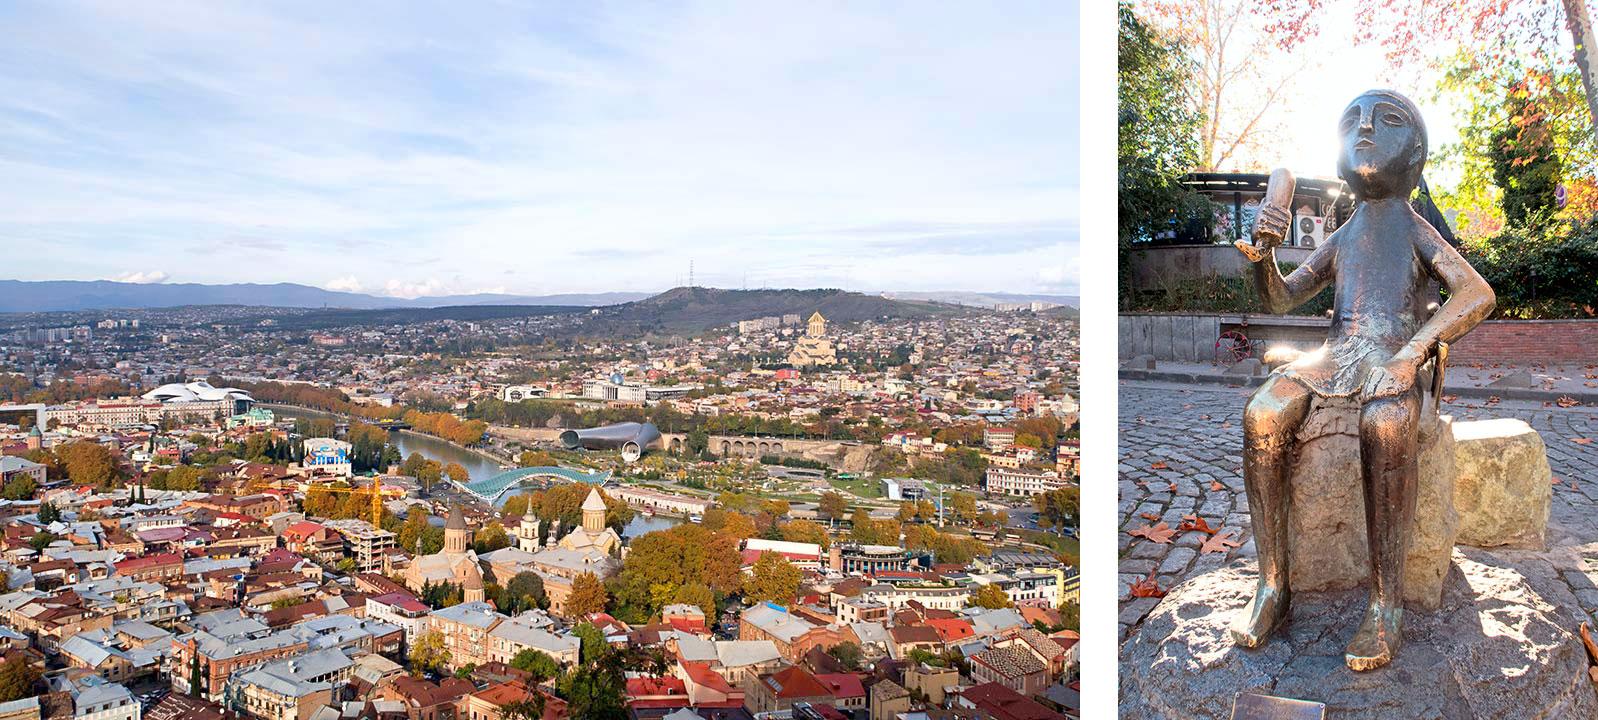 Тамада Шардени Тбилиси Панорама Столица Грузии Отдых Тур по Грузии NAMERANI.jpg